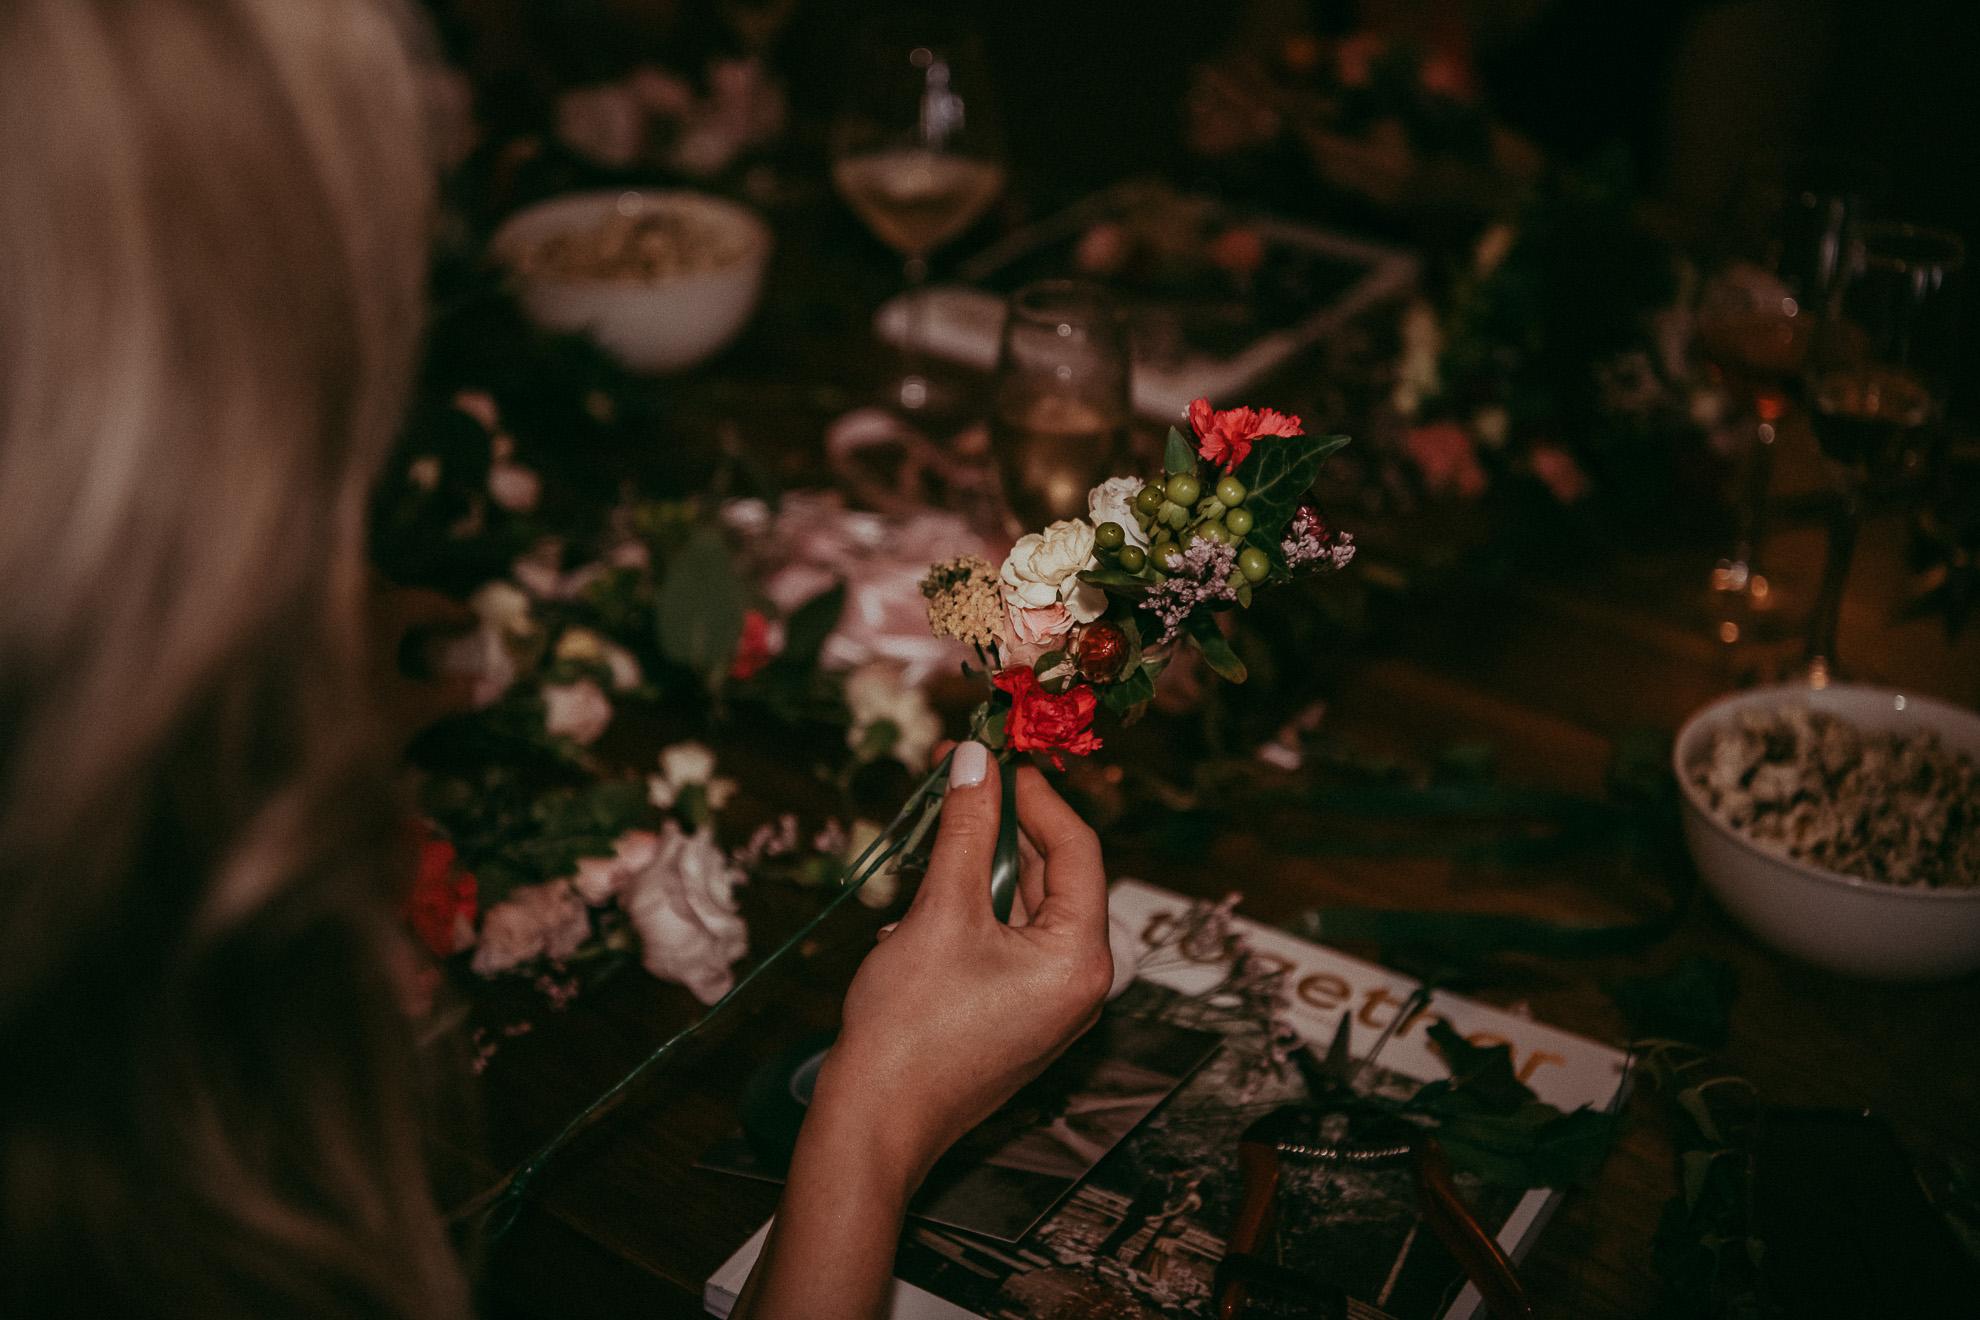 flower-workshop-by-olgalevien-28.jpg